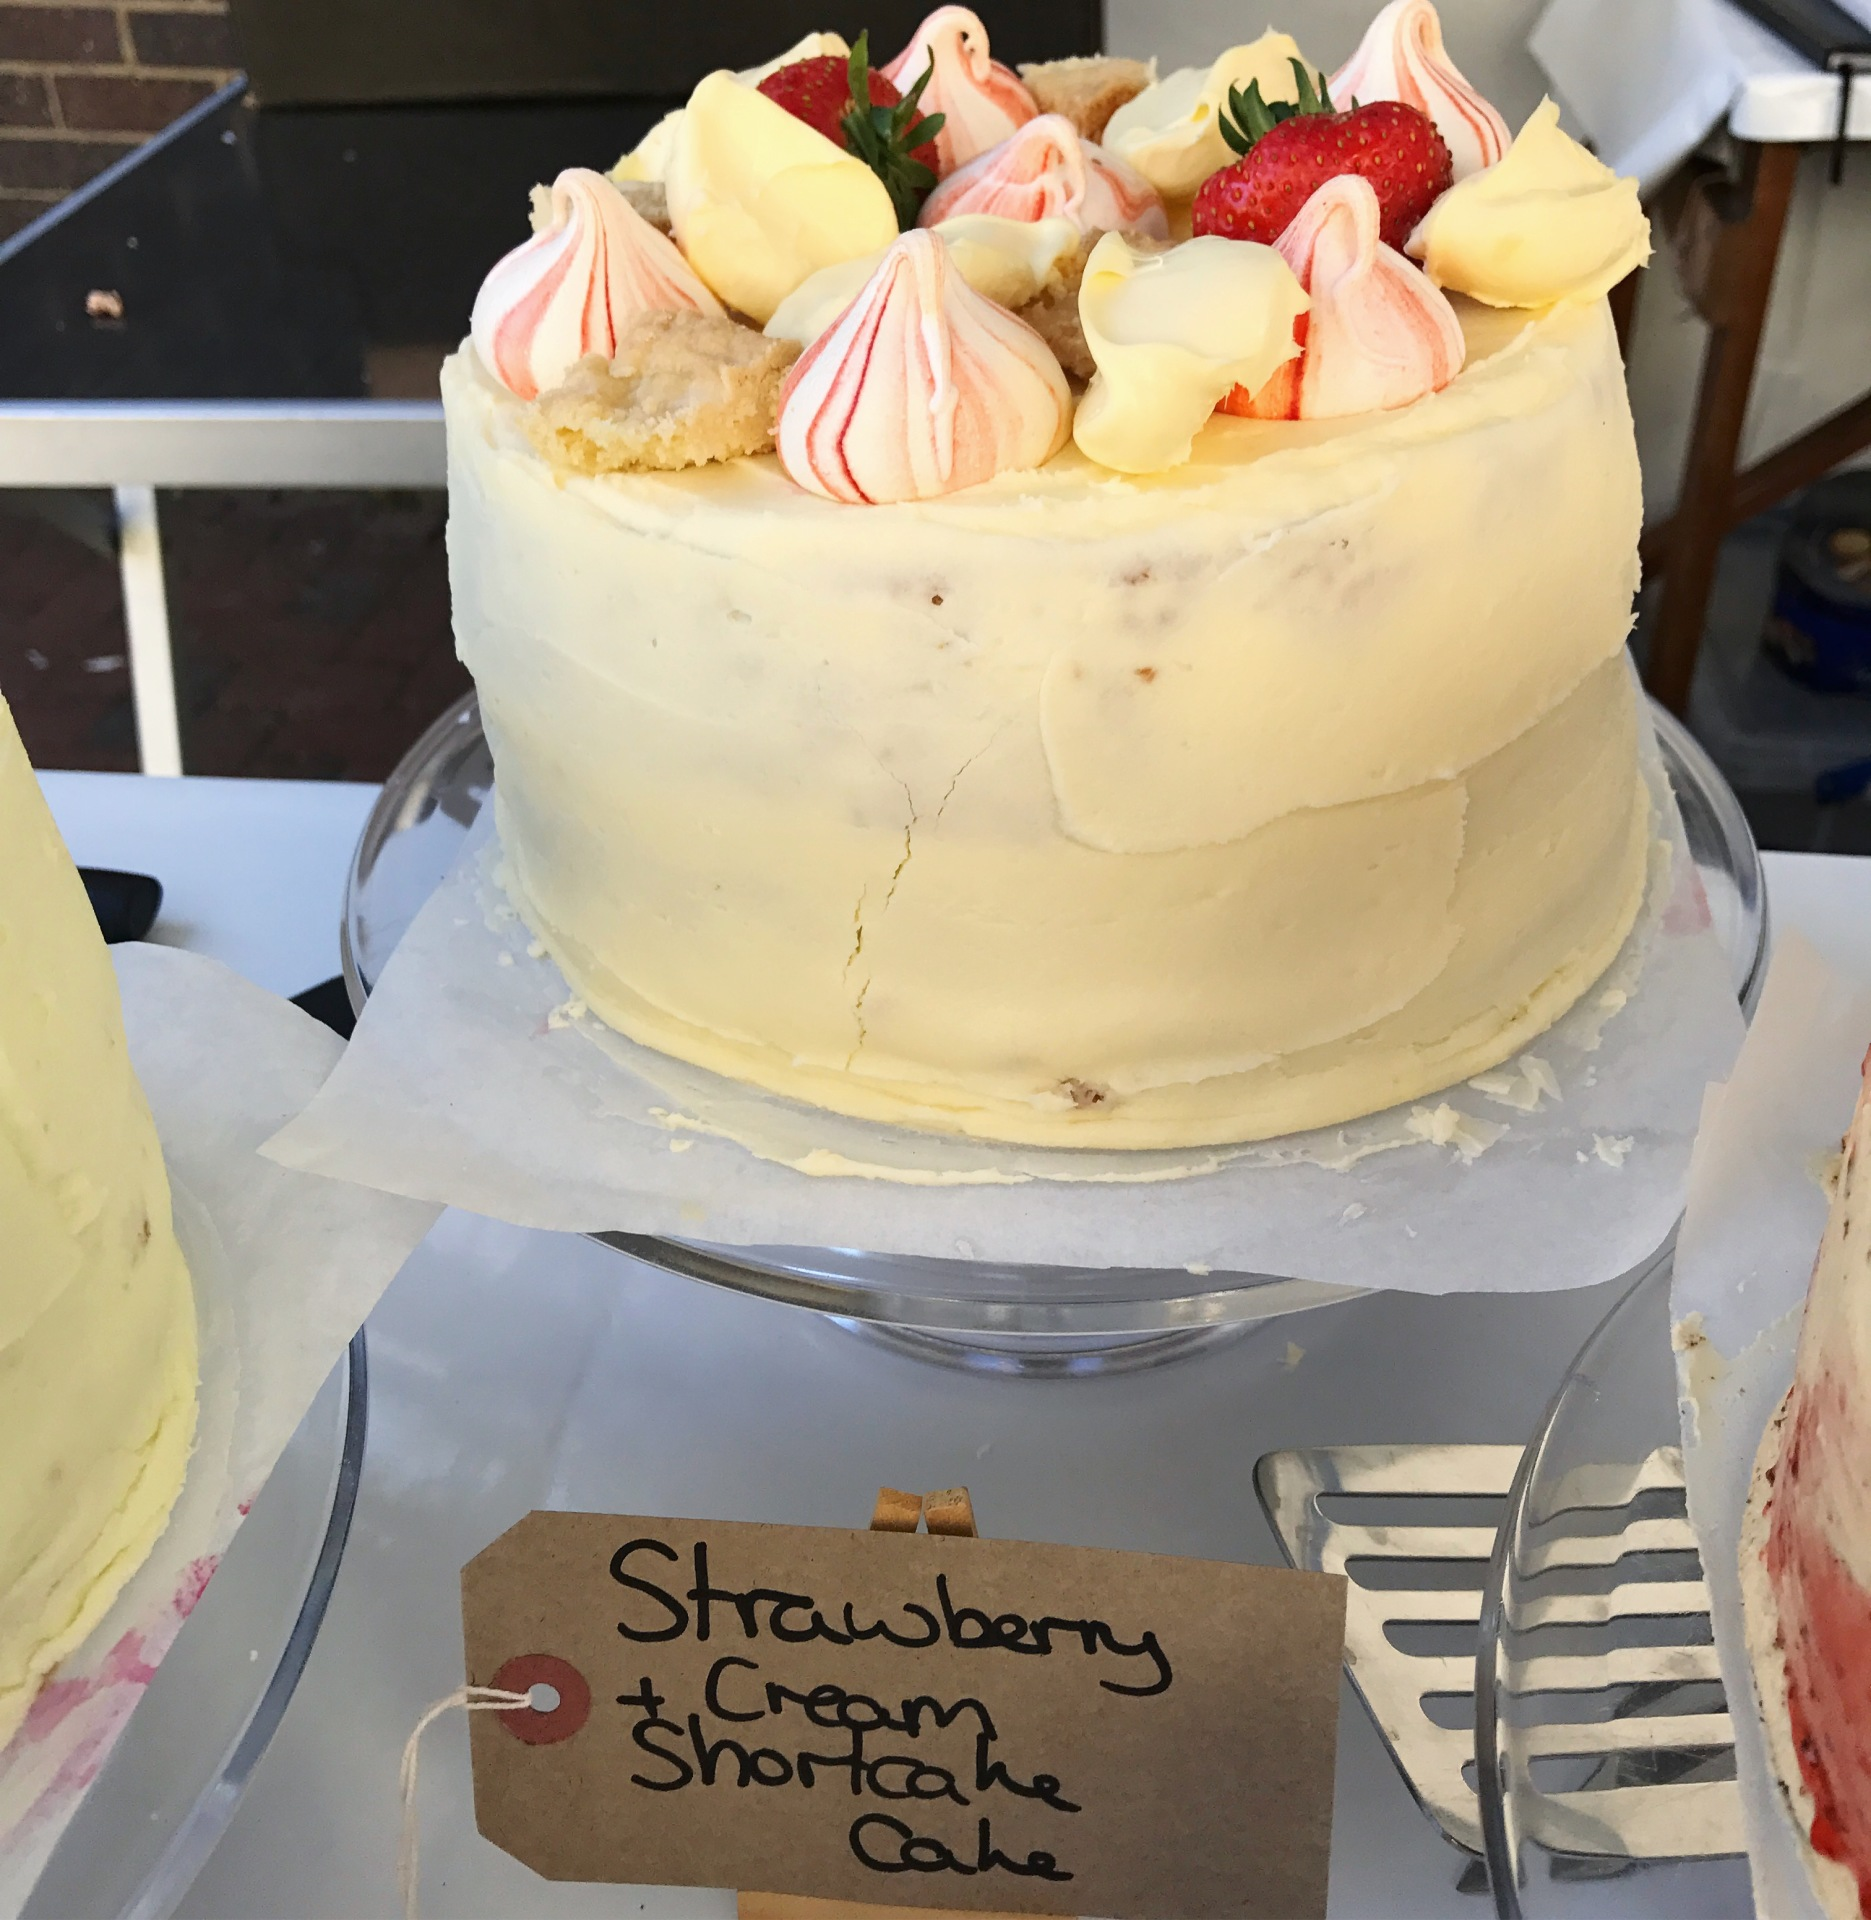 Strawberry and Cream Shortcake Cake